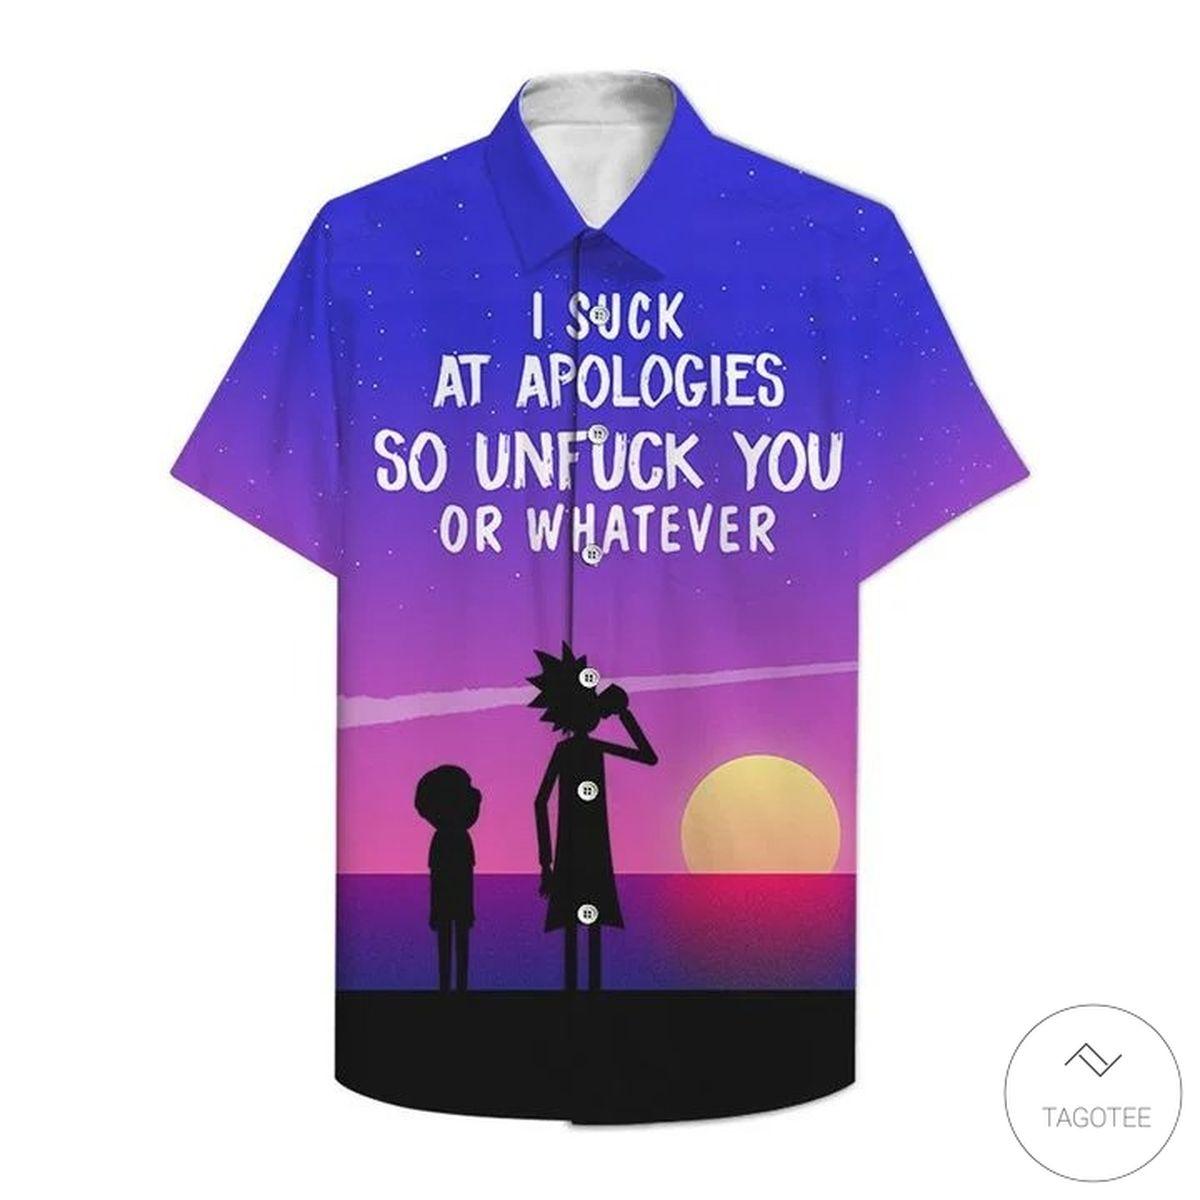 I Suck At Apologies So Unfuck You Or Whatever Hawaiian Shirt